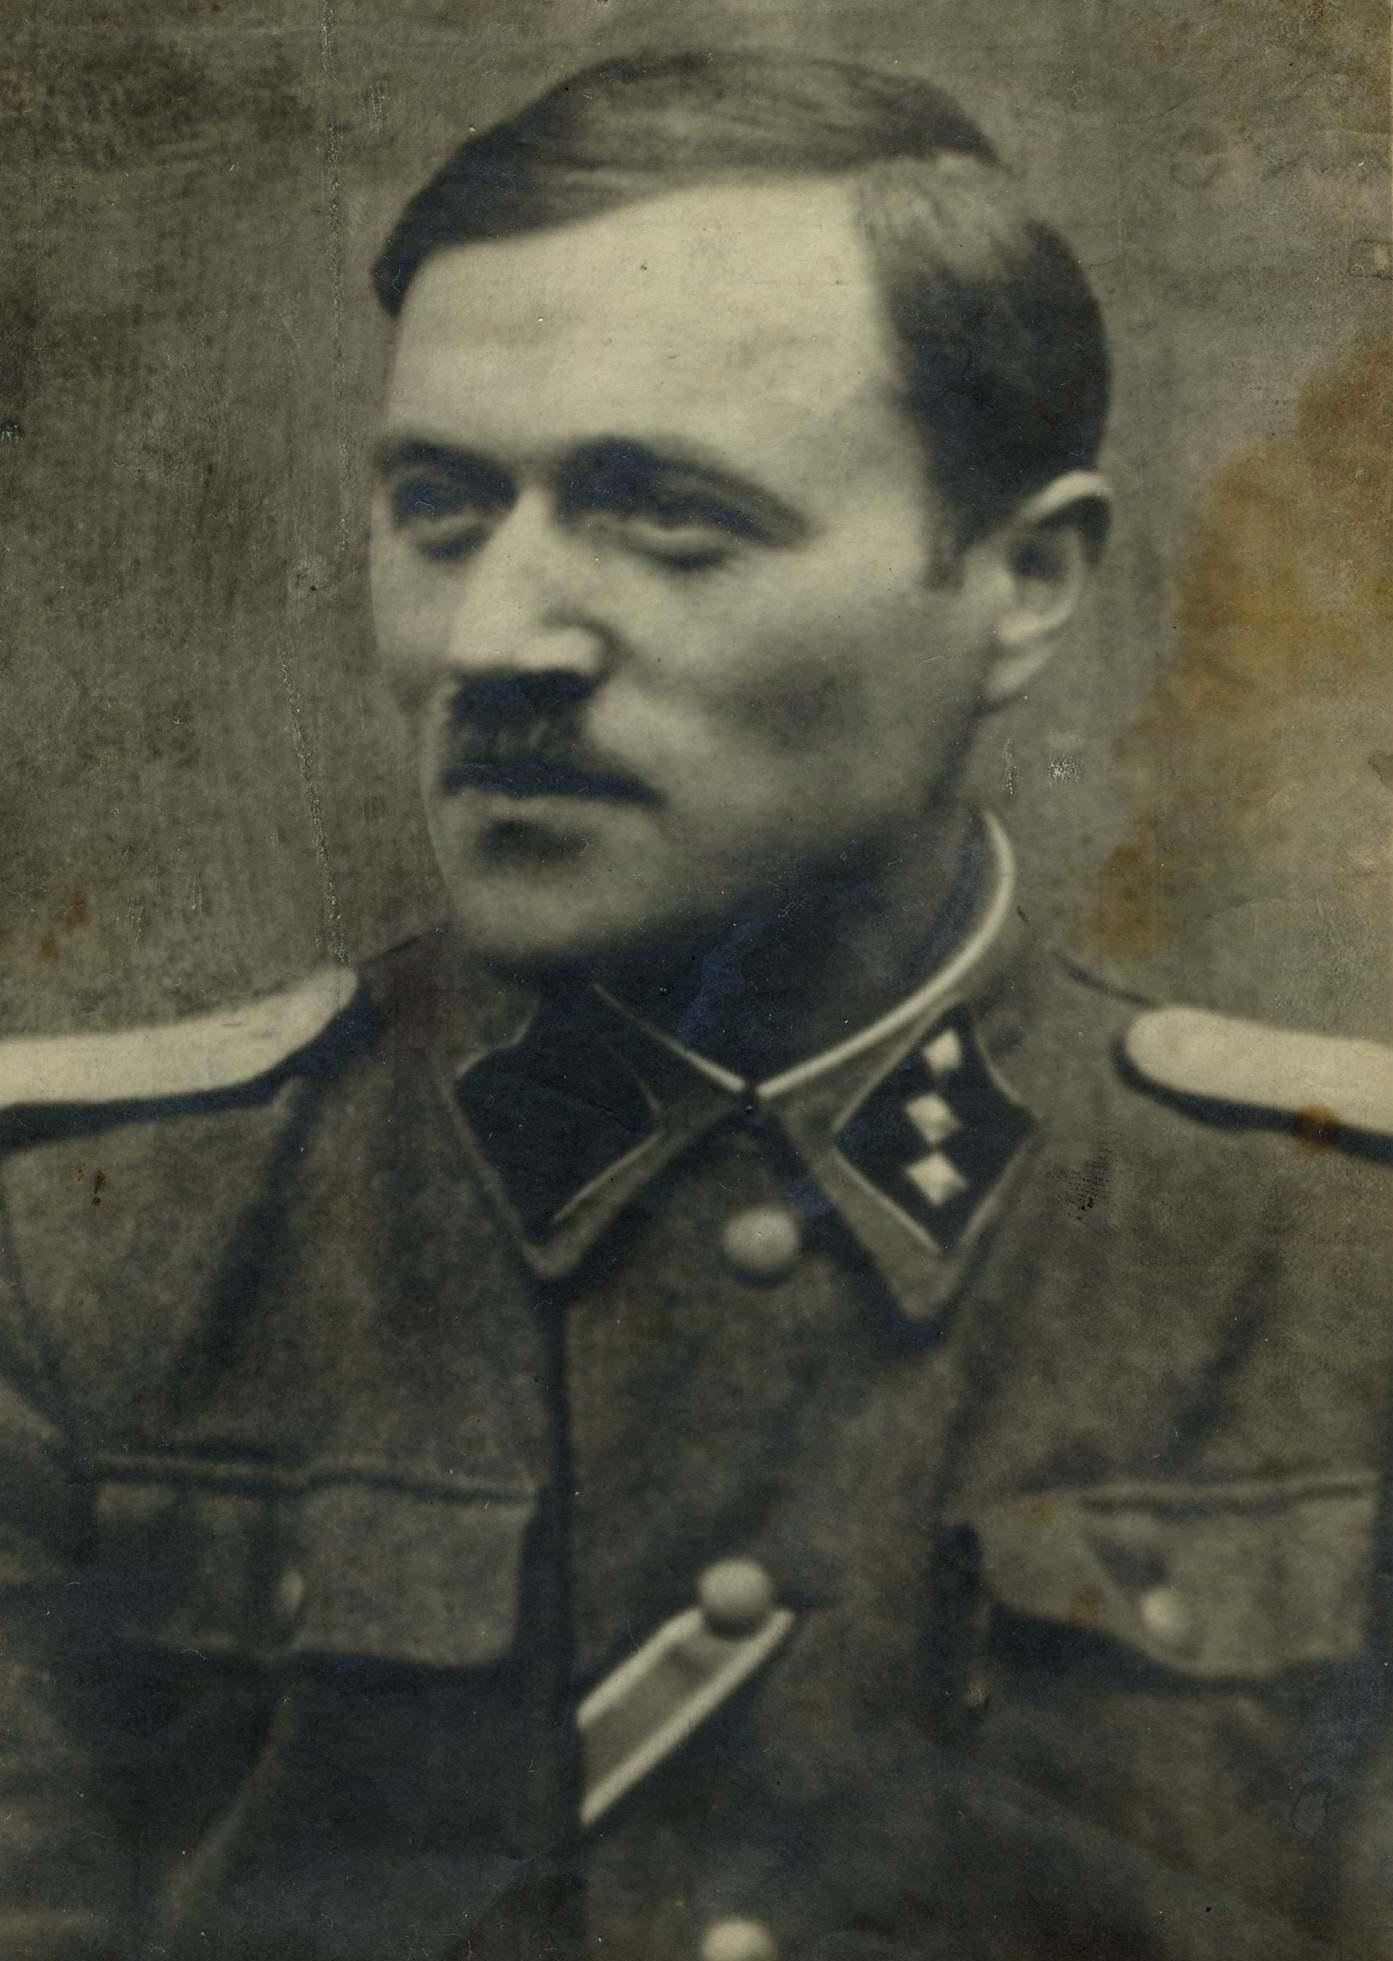 Popa D. - in uniforma de militar hp 1